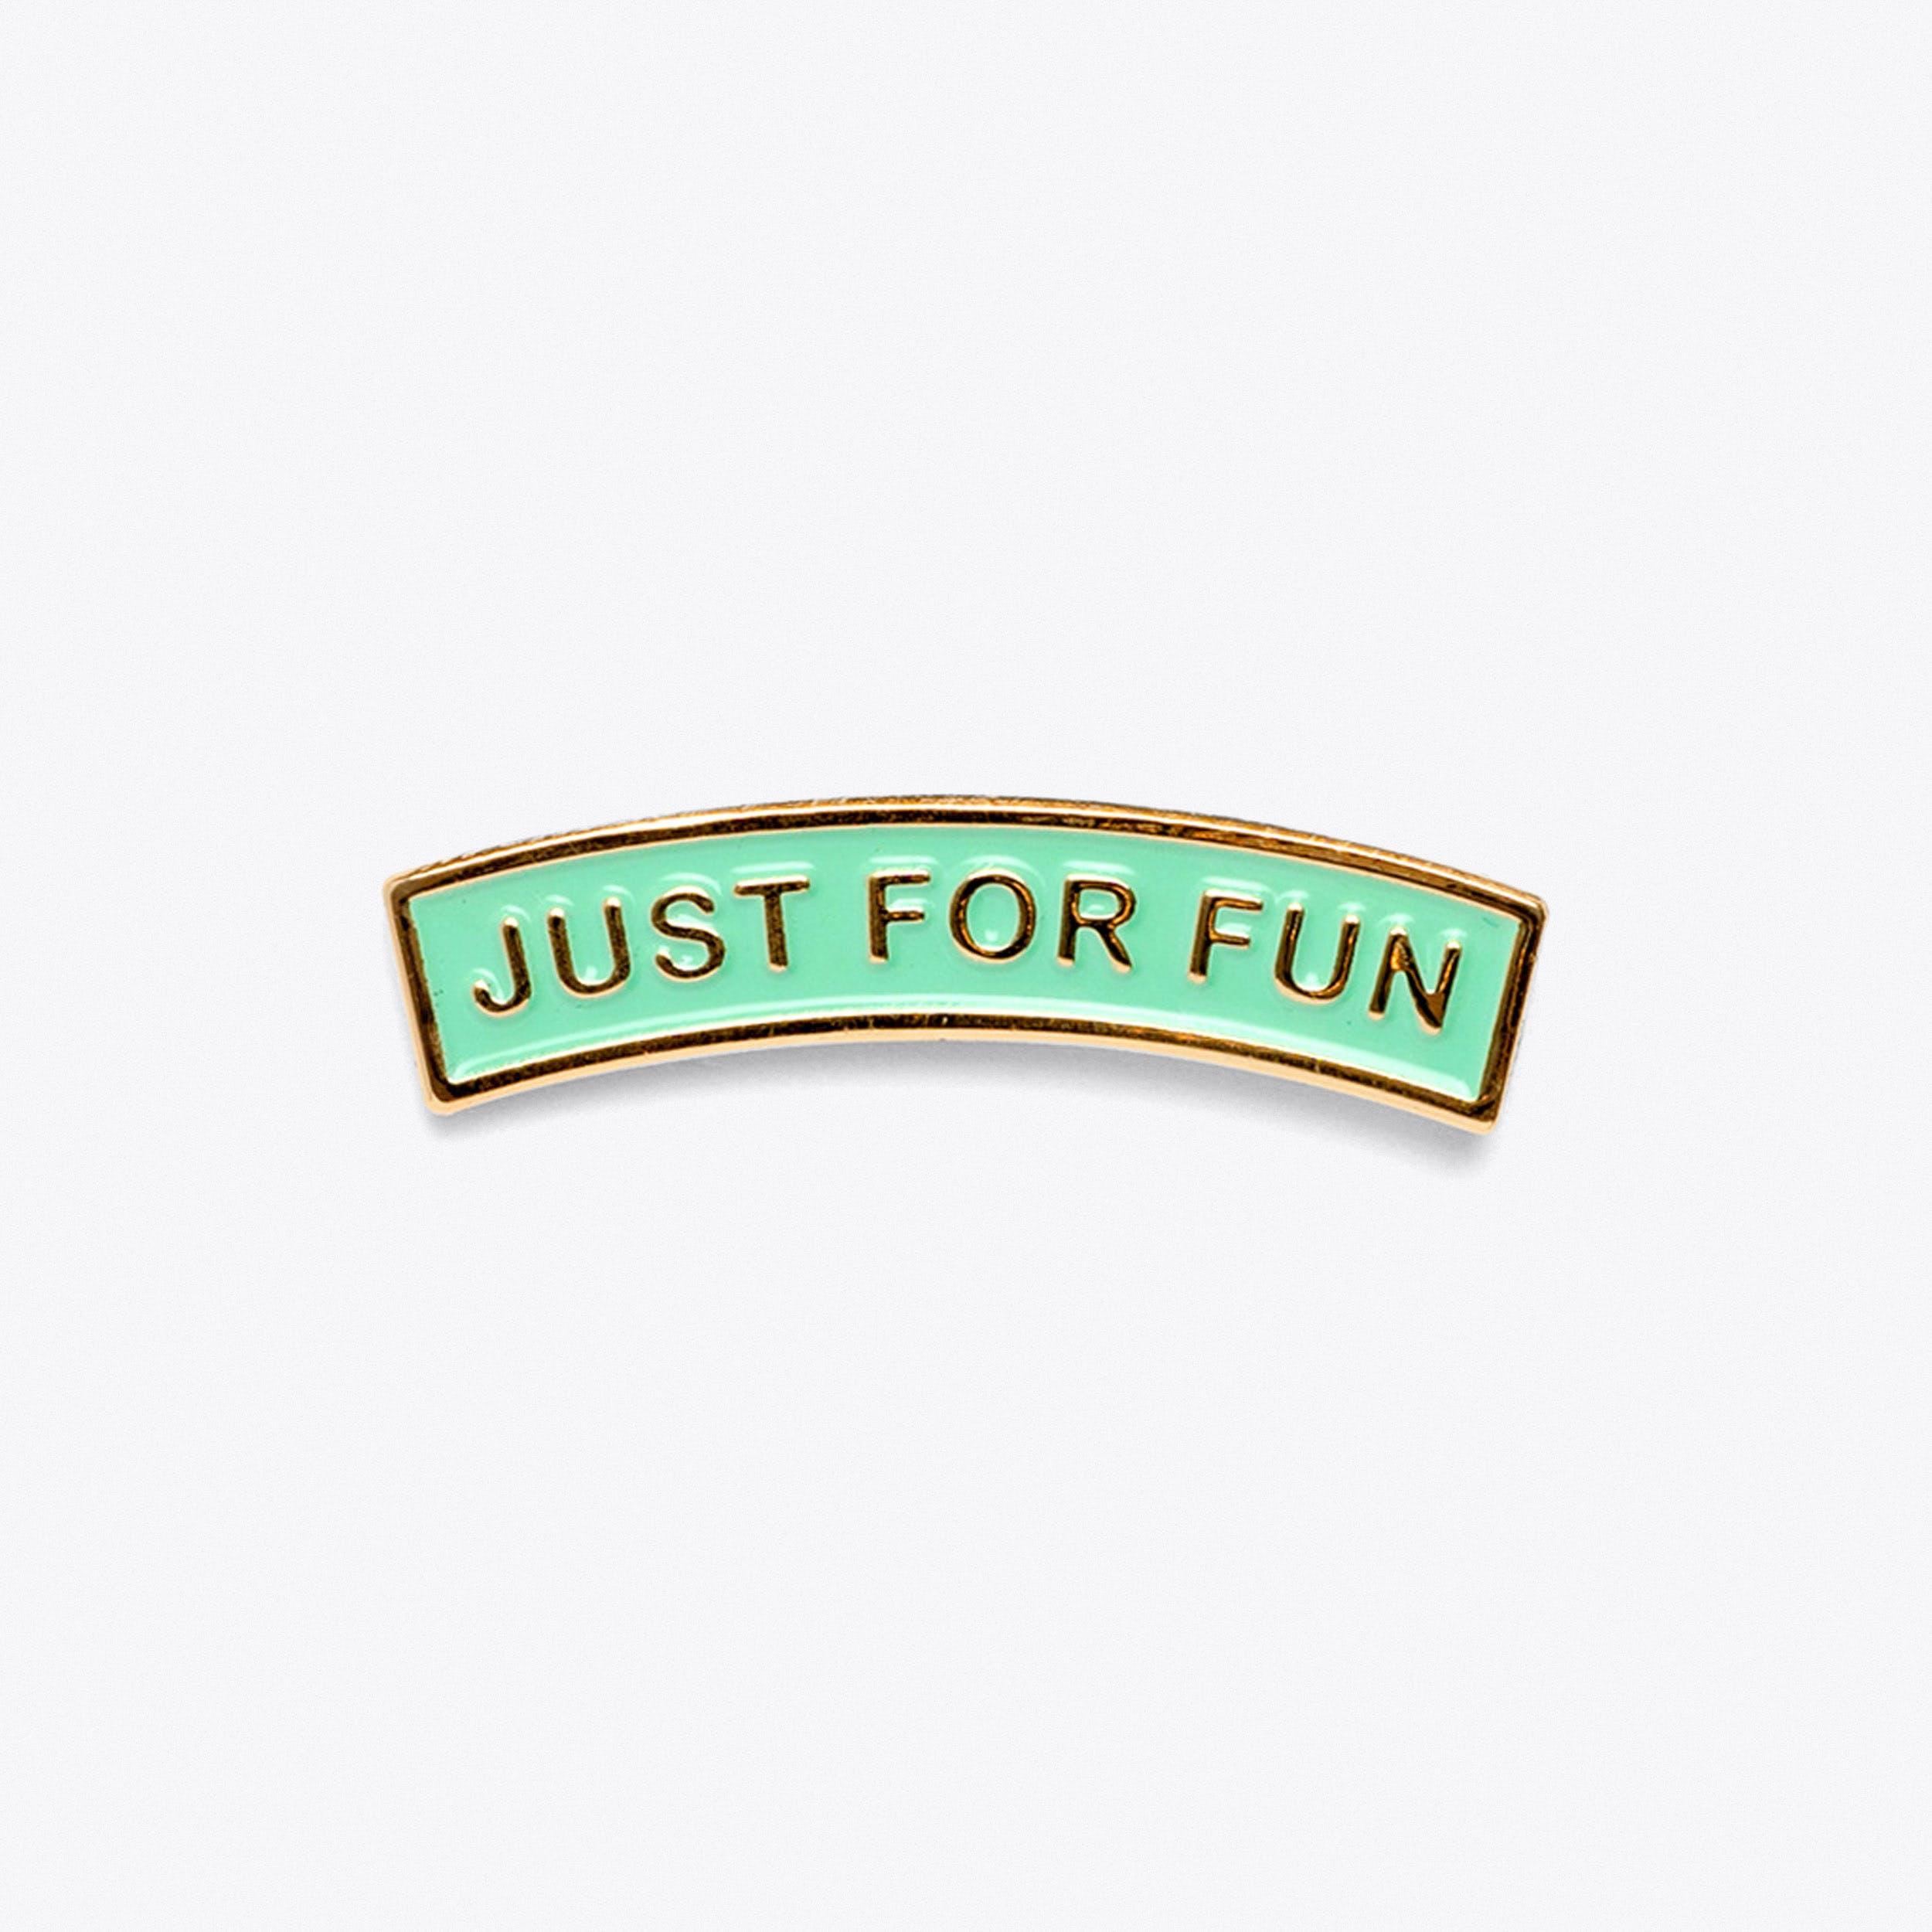 Just For Fun Pin